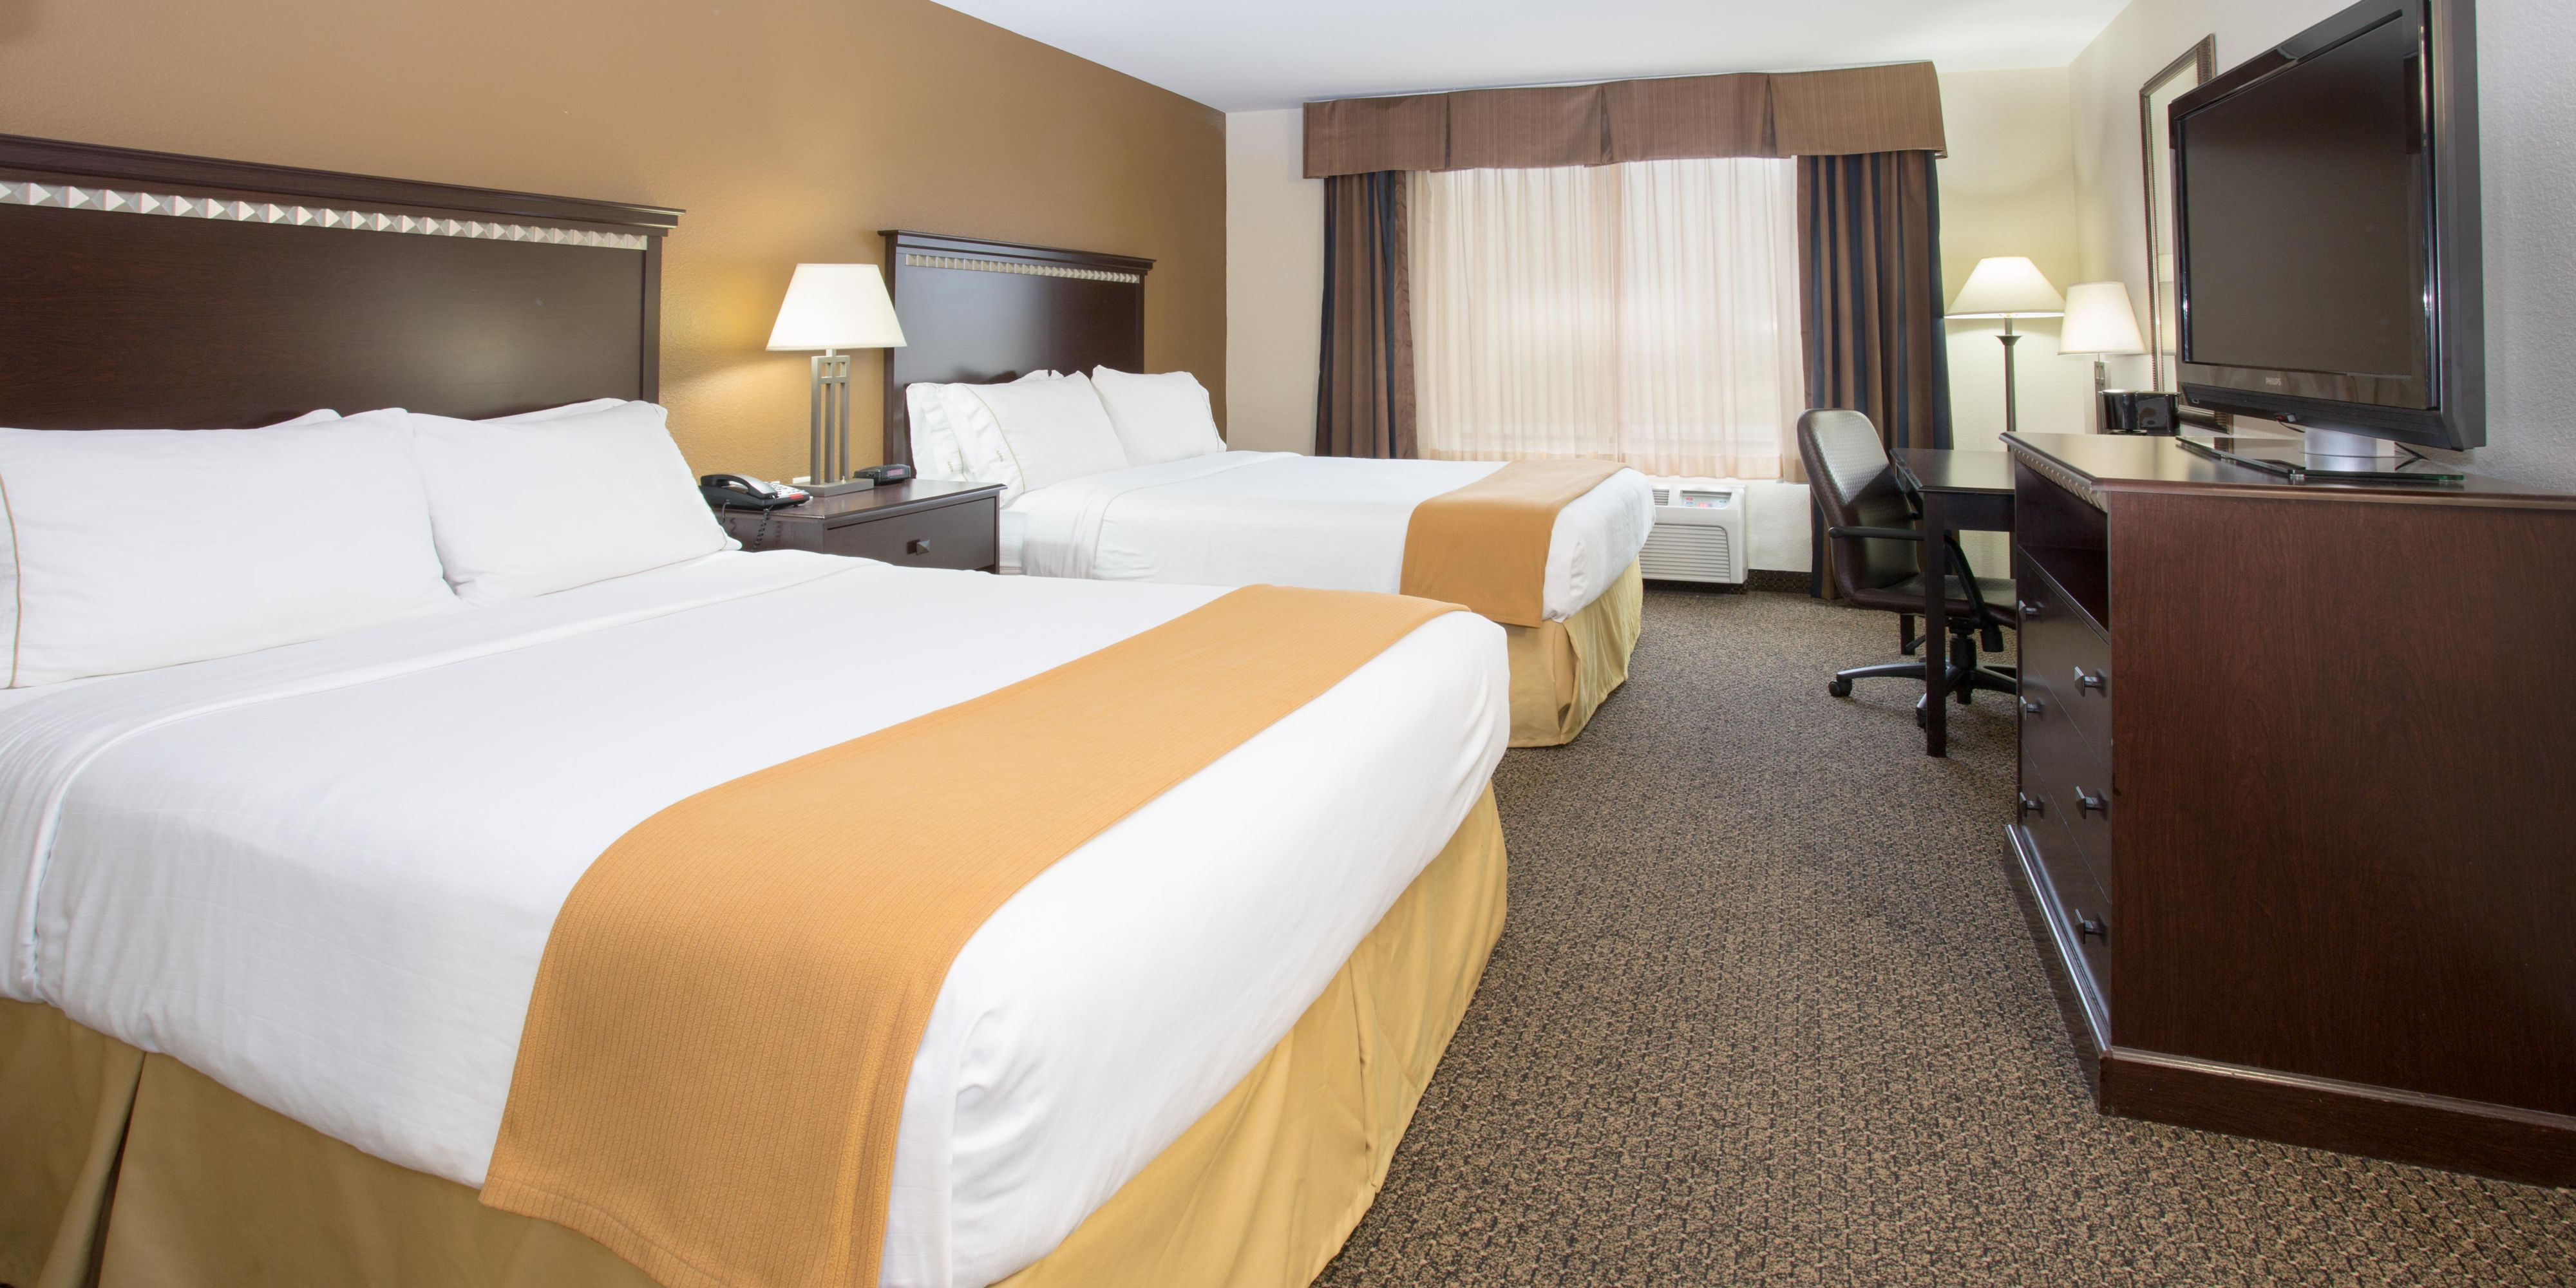 Holiday Inn Express & Suites Pueblo North Hotel by IHG